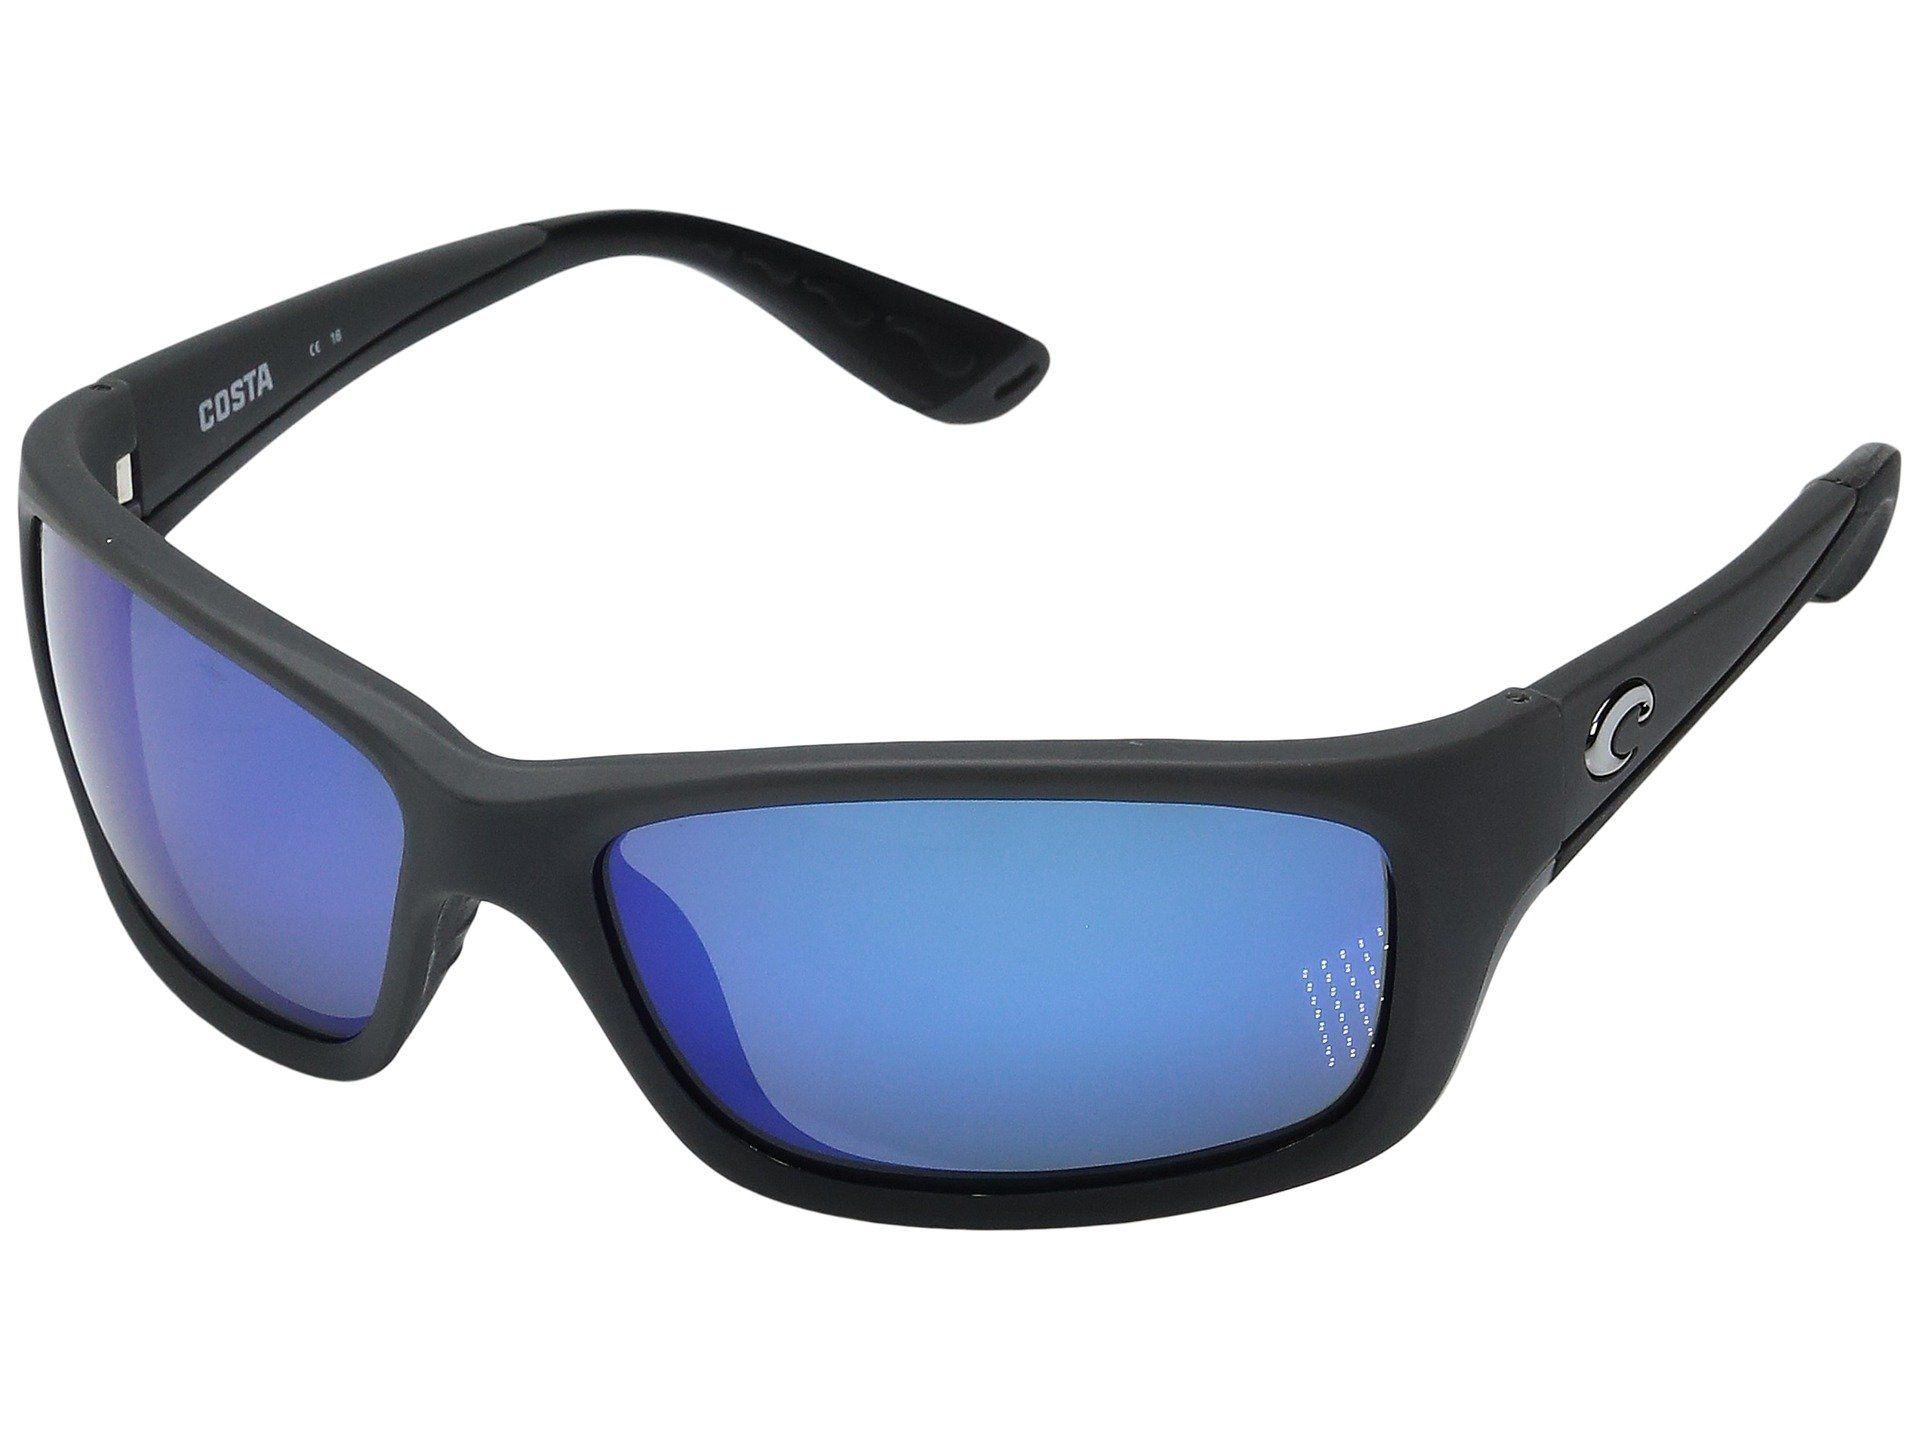 0c2955da2 سعر Bvlgari Square Women's Sunglasses - BV8173B-504/13-56 - 56-17 ...